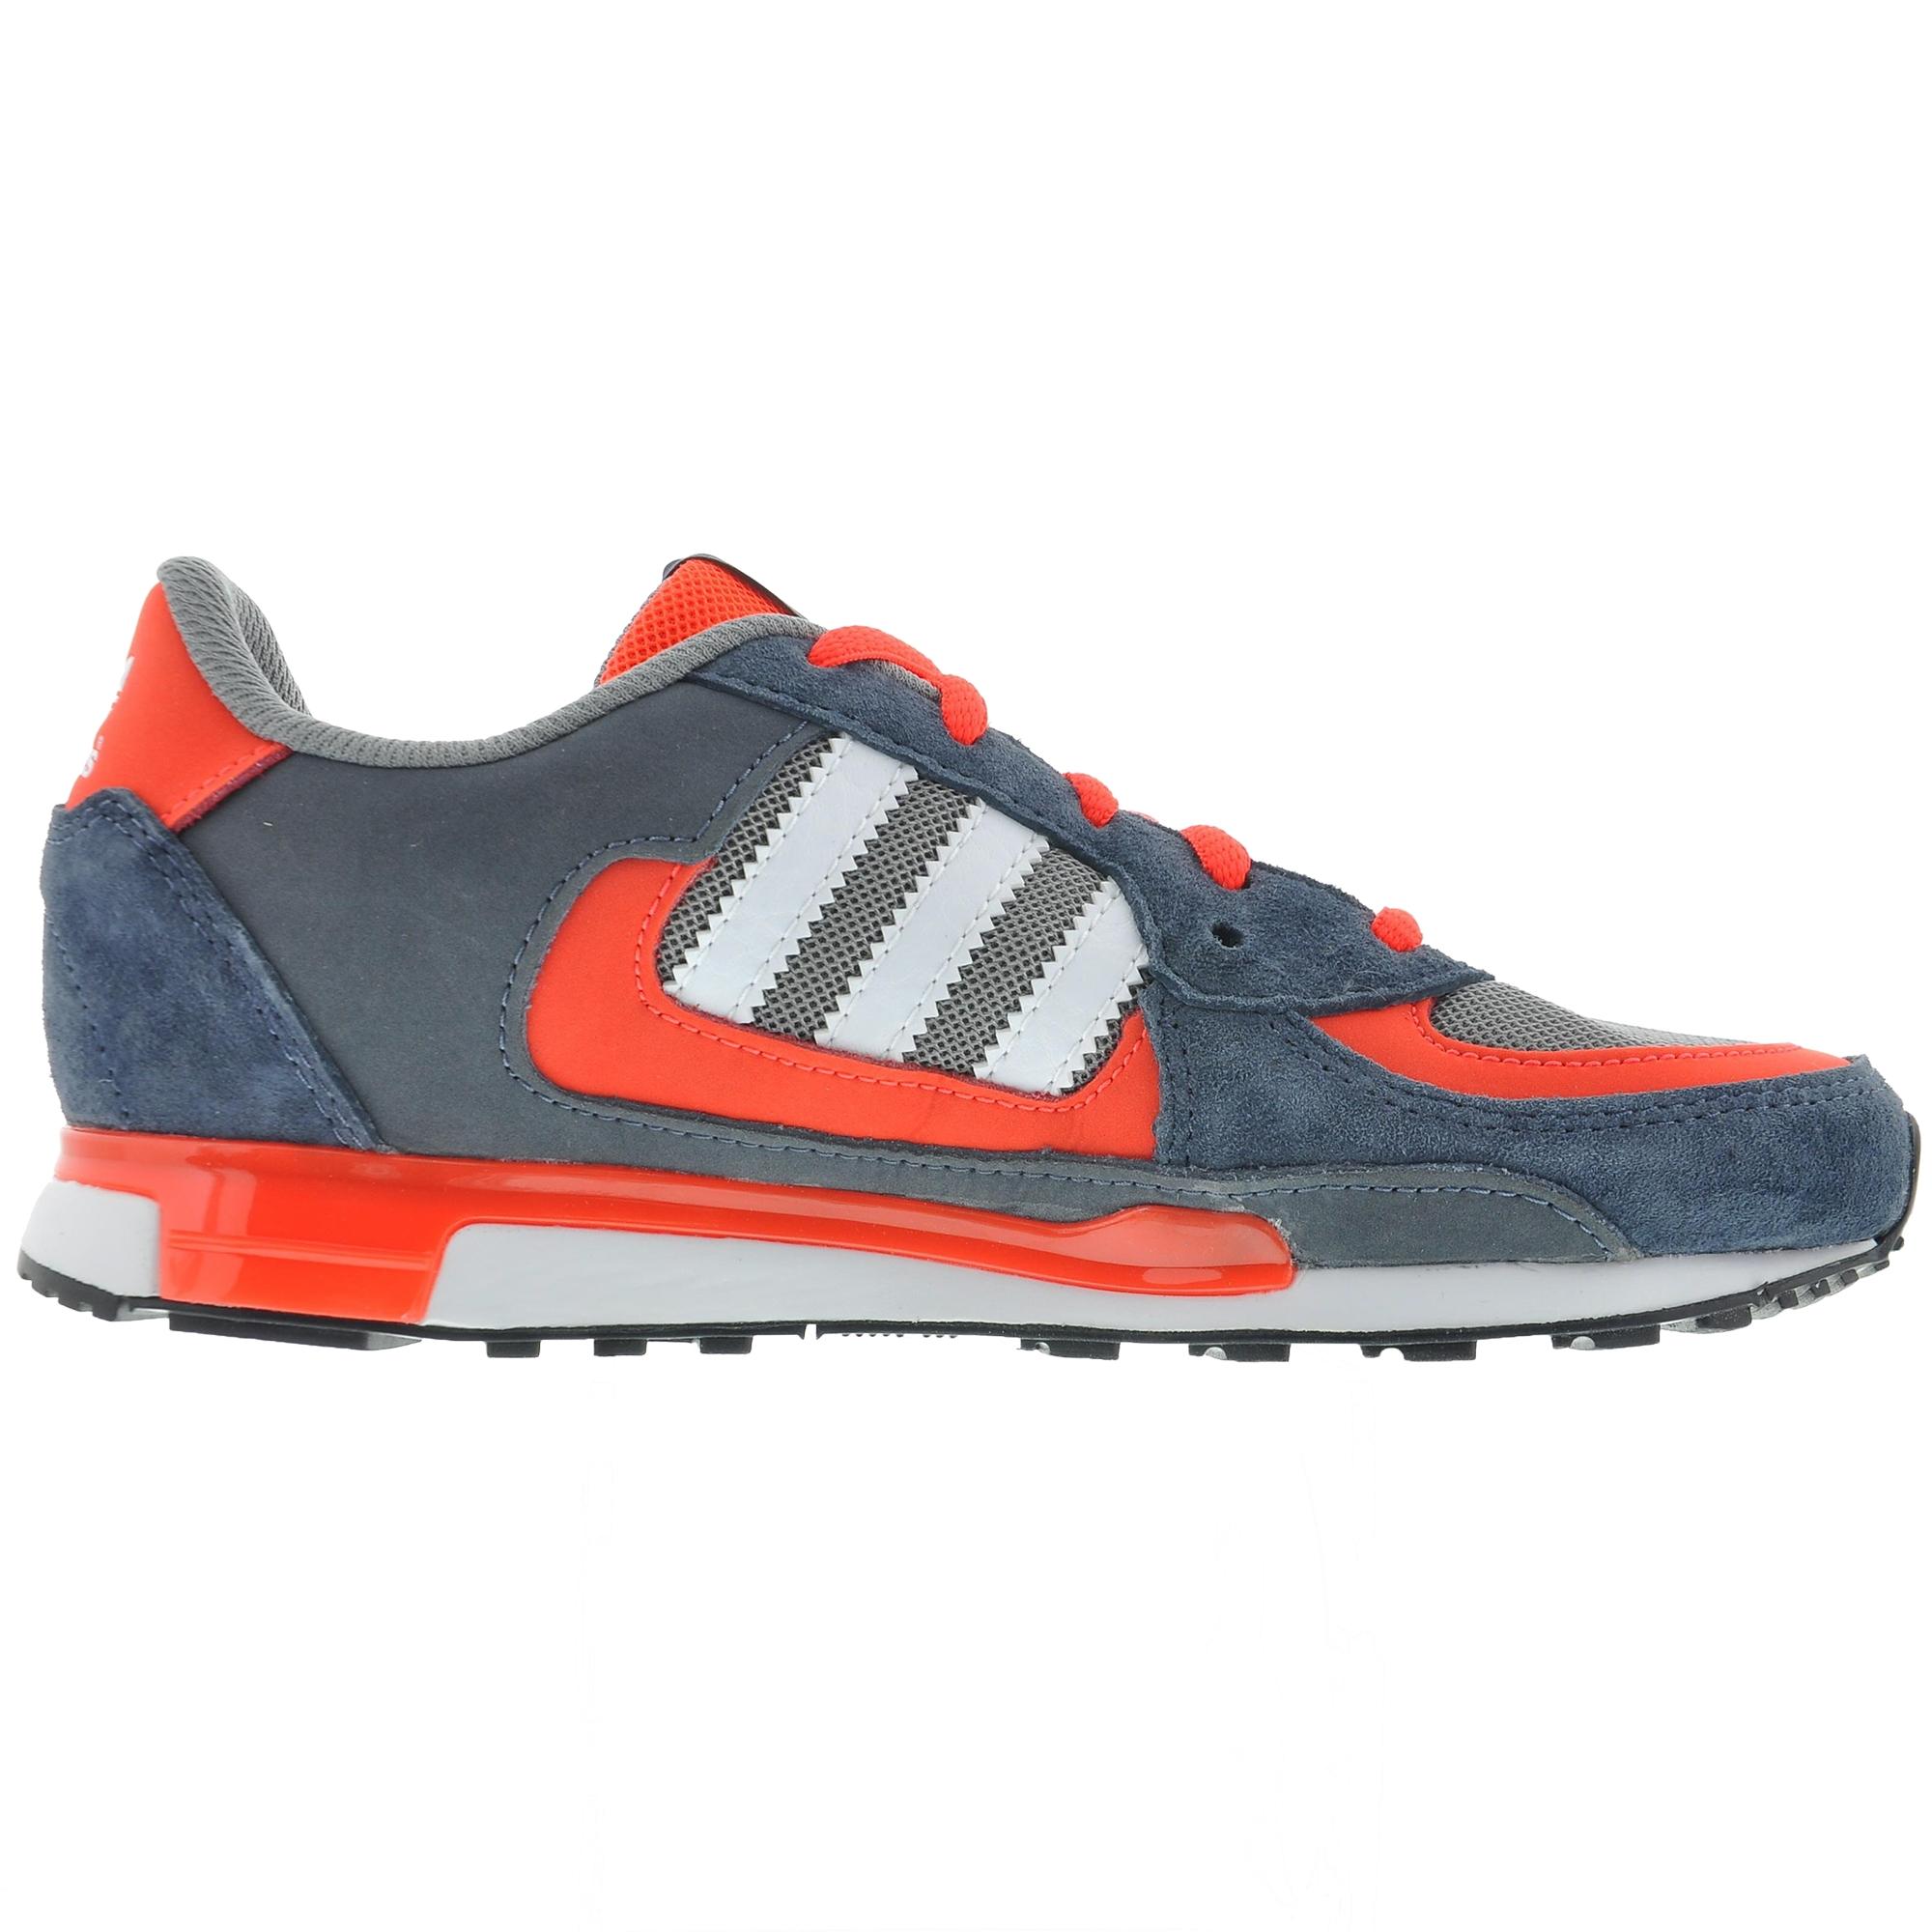 cb77615fd ... ireland adidas zx 850 fw14 Çocuk spor ayakkab cd3bf 0f68e